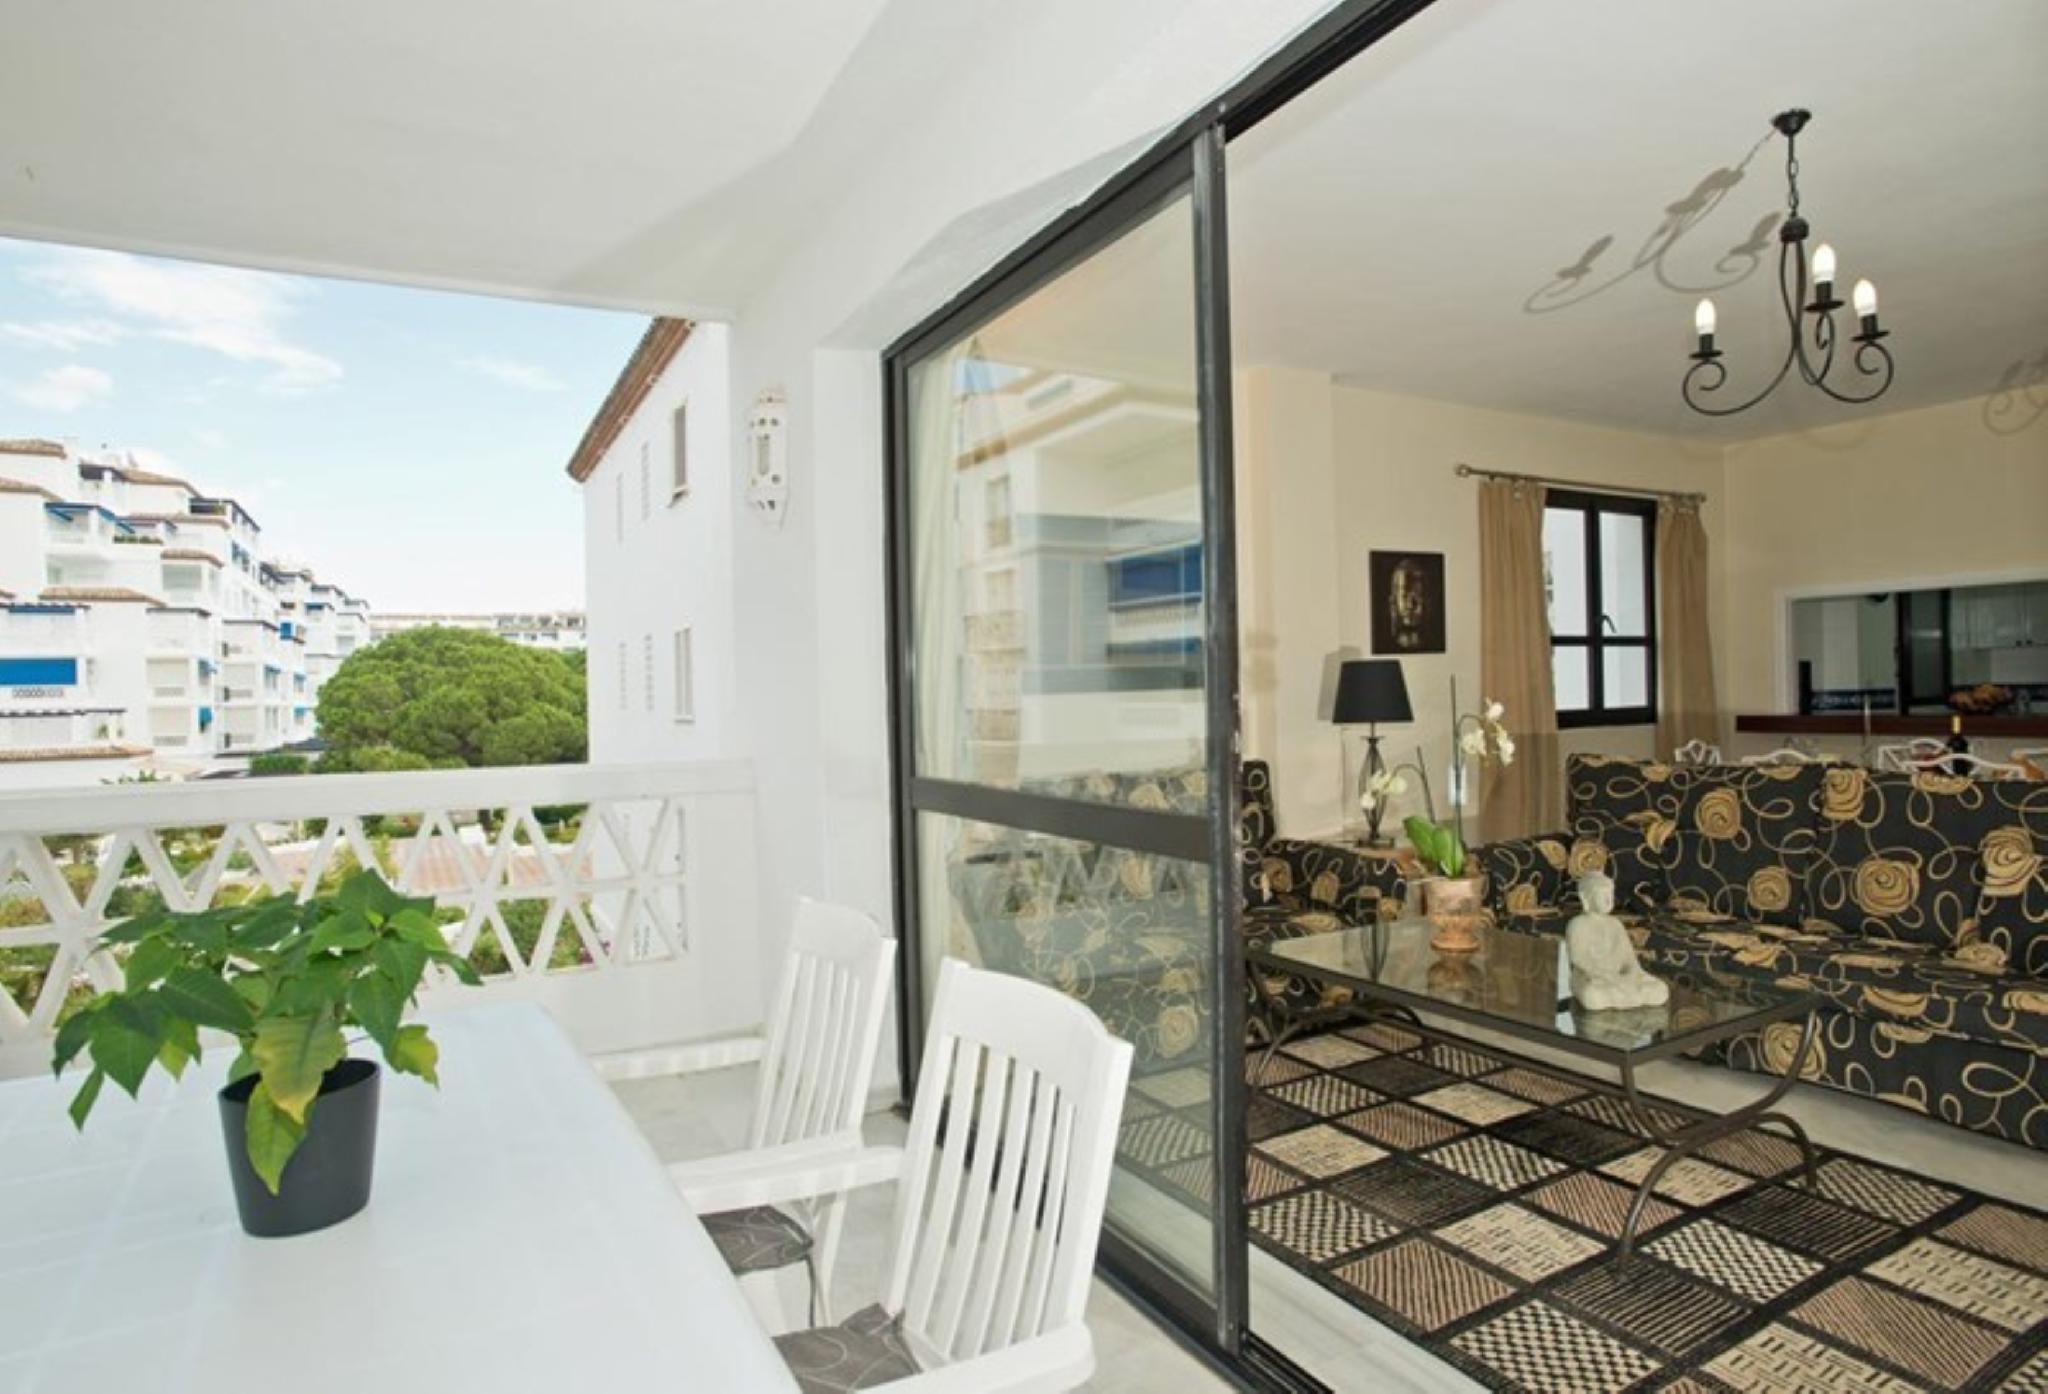 102956 -  Apartment in Marbella